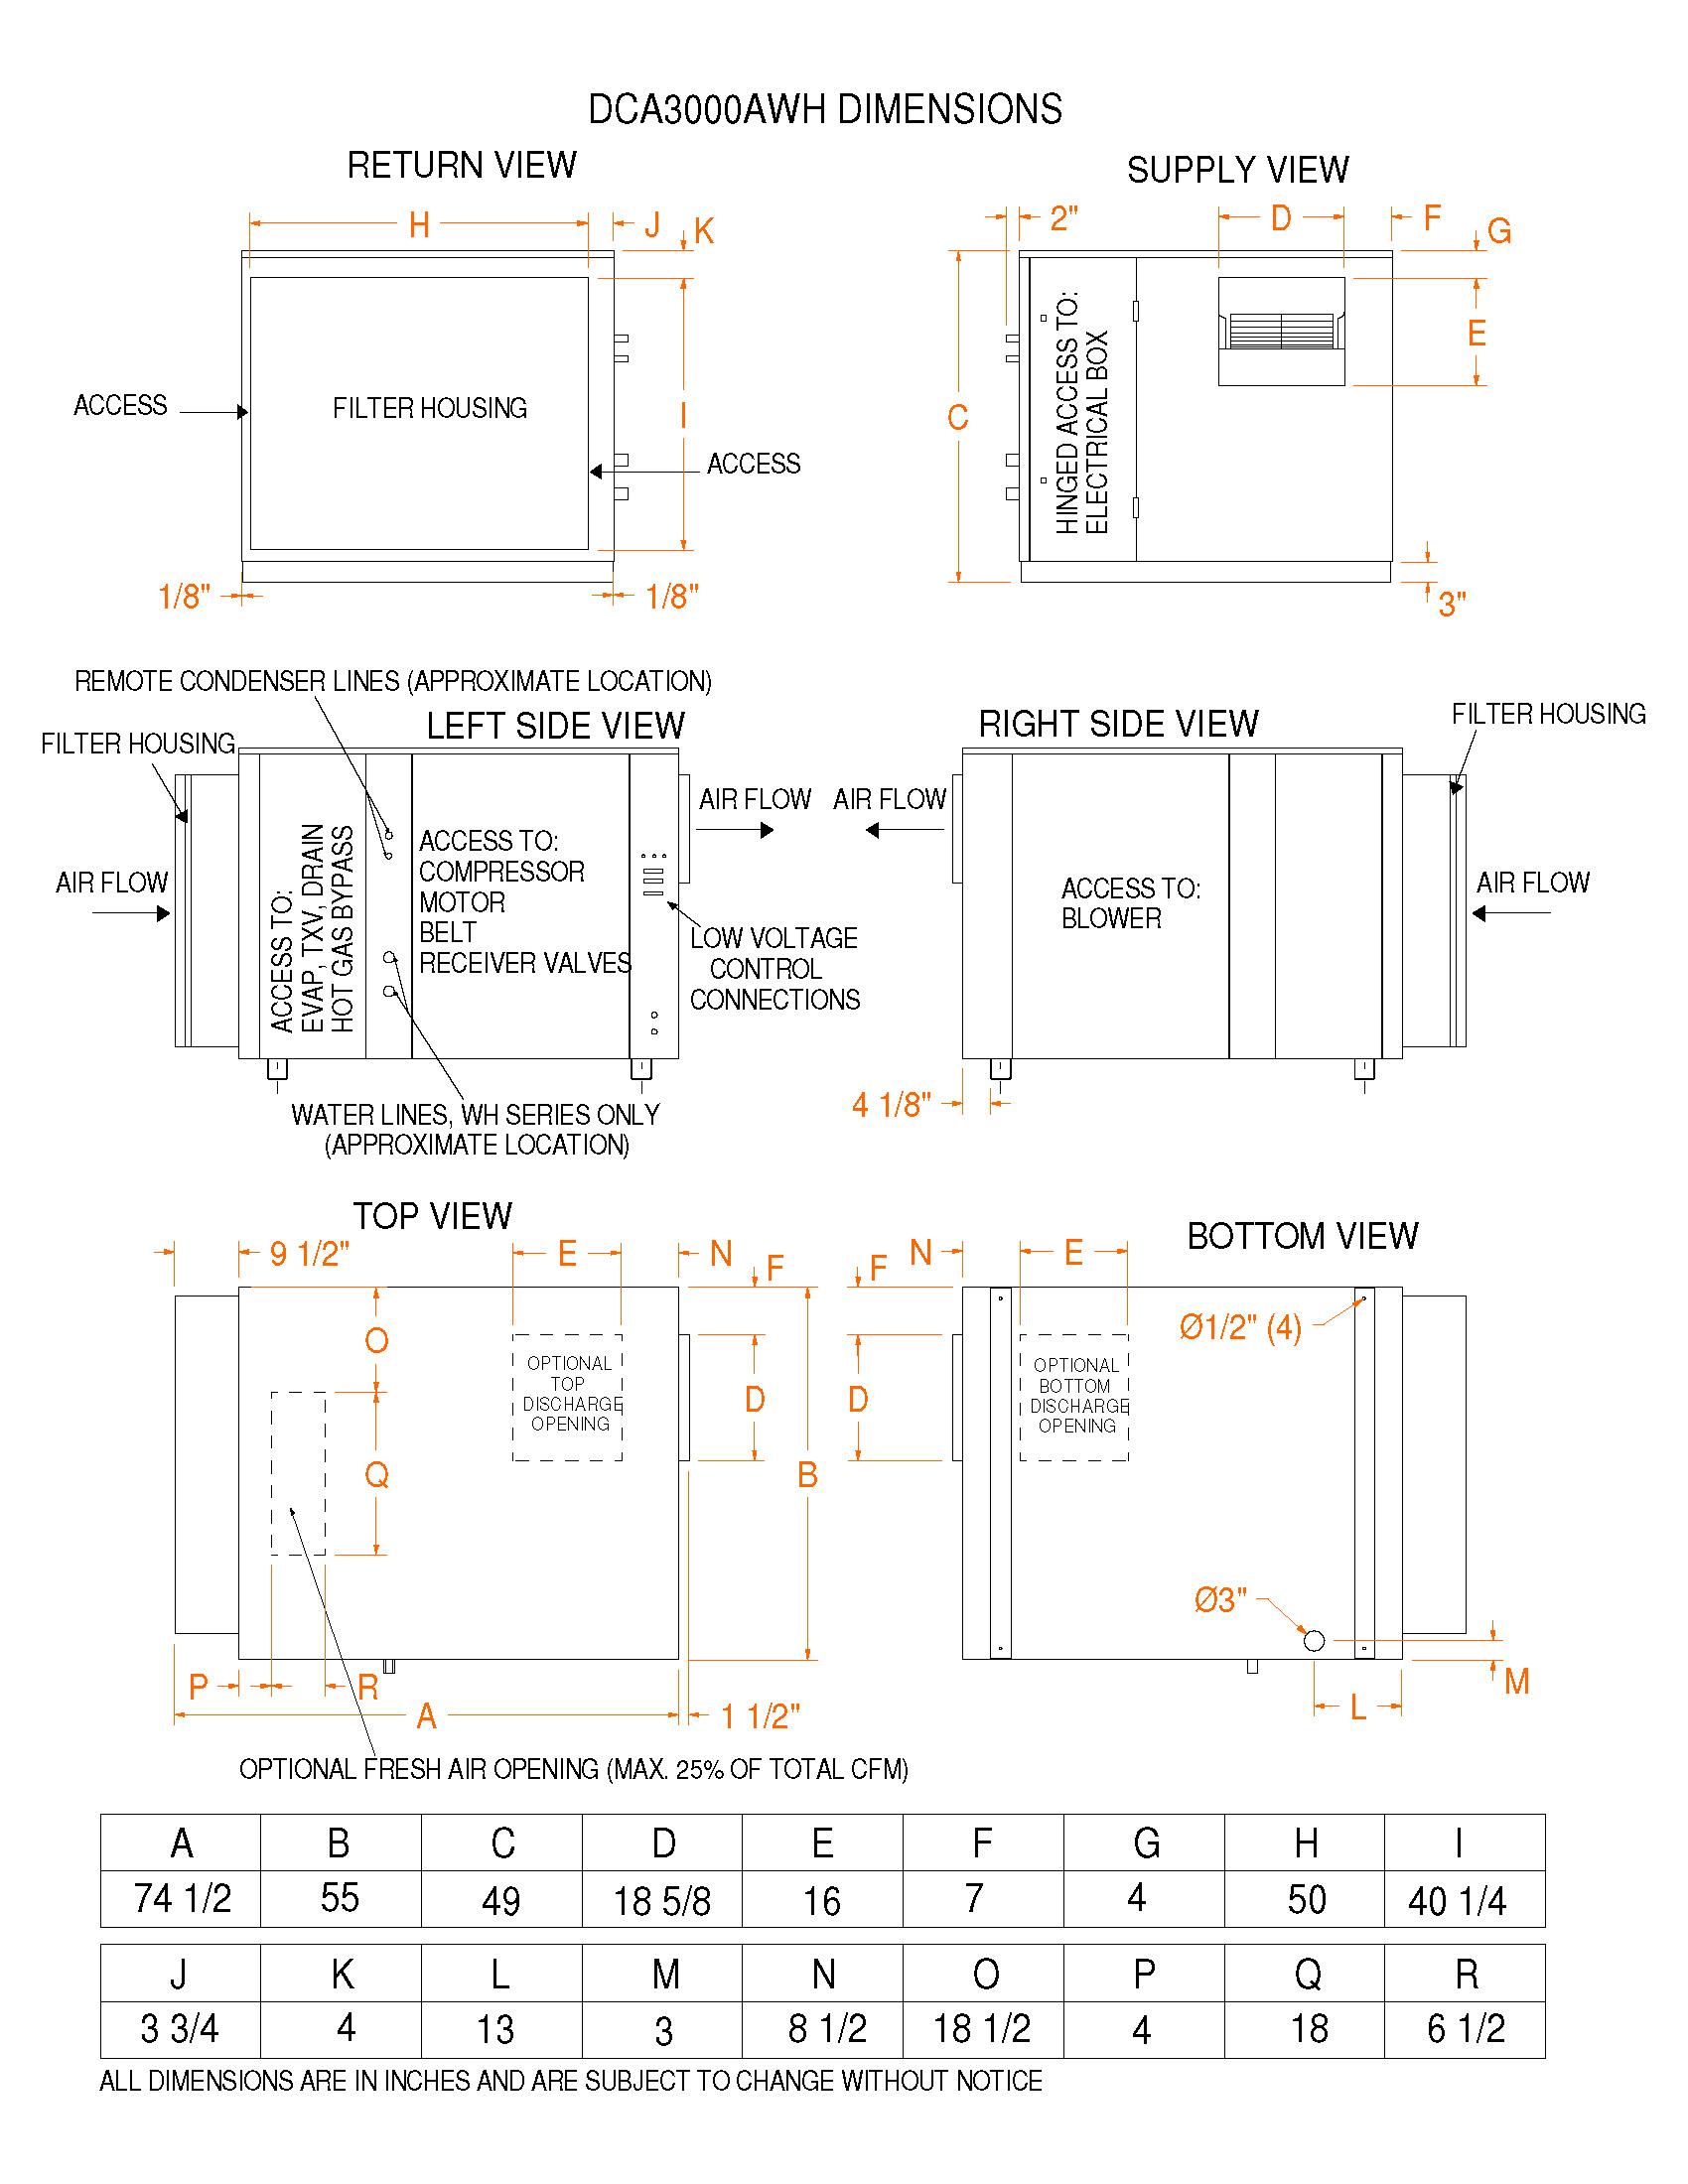 Geothermal Dehumidifier Dca Pool Dehumidifiers Wiring Diagram Model Awh Water Heating Assist 1700x2200